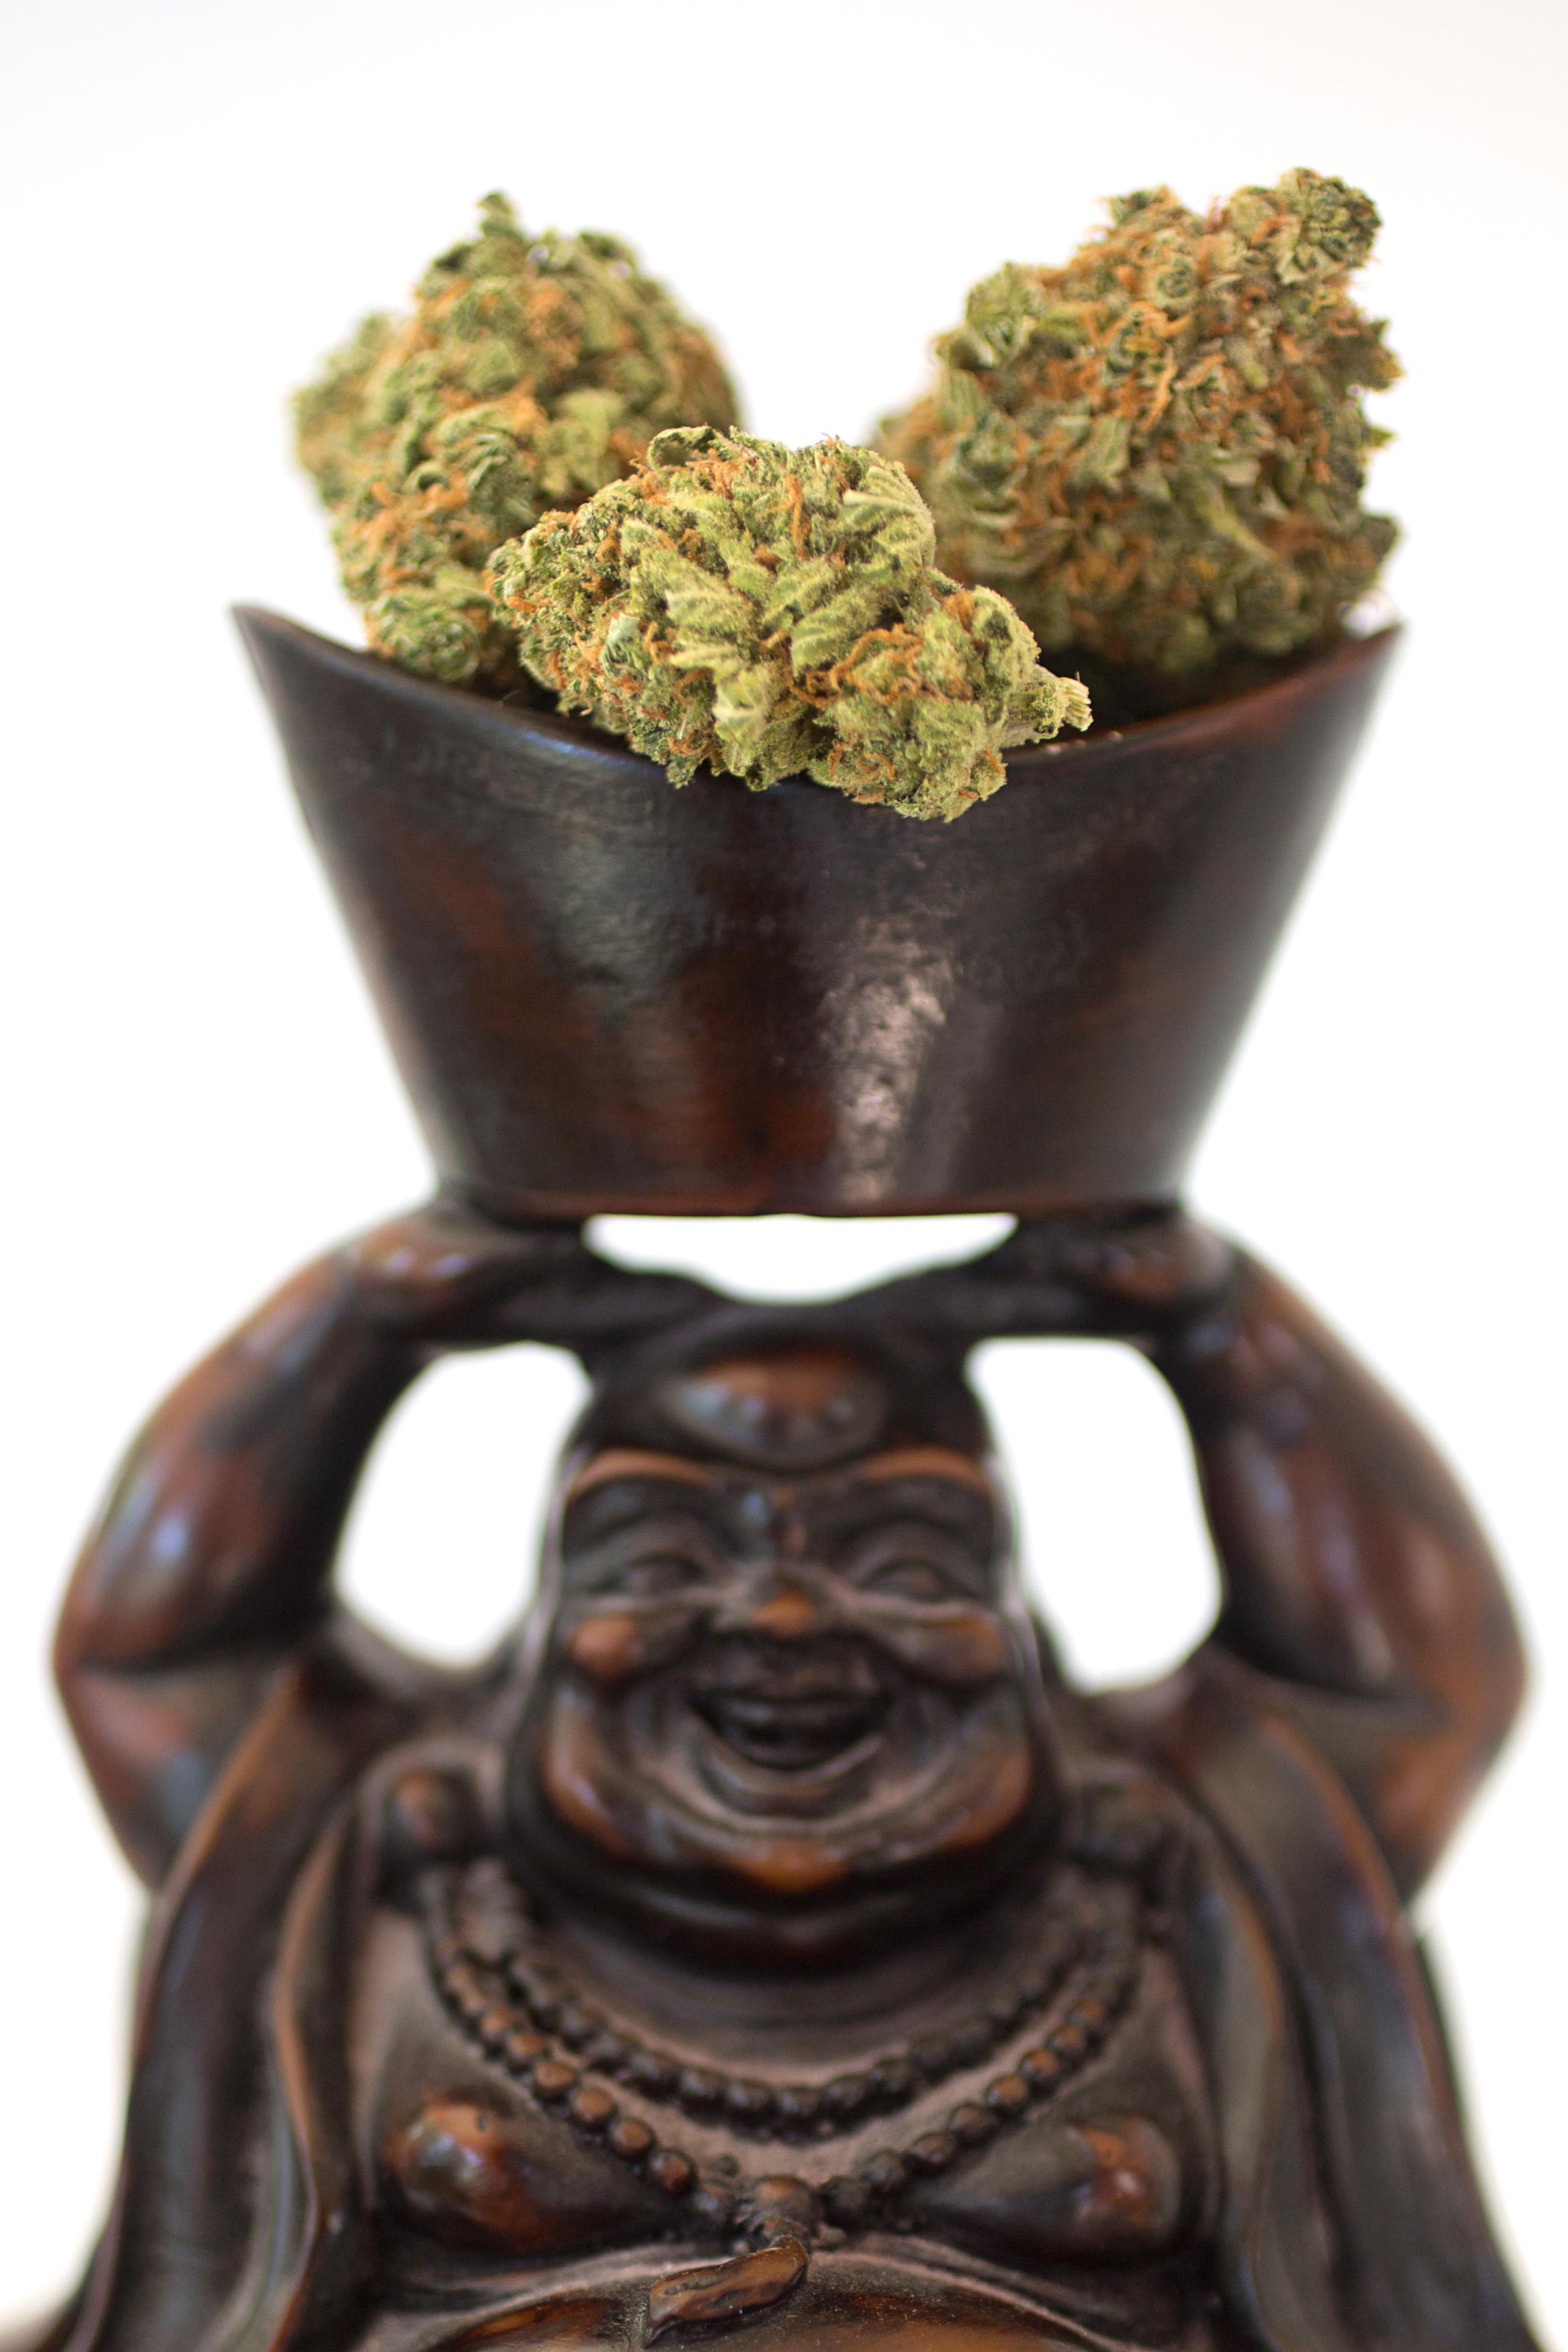 Buda with product